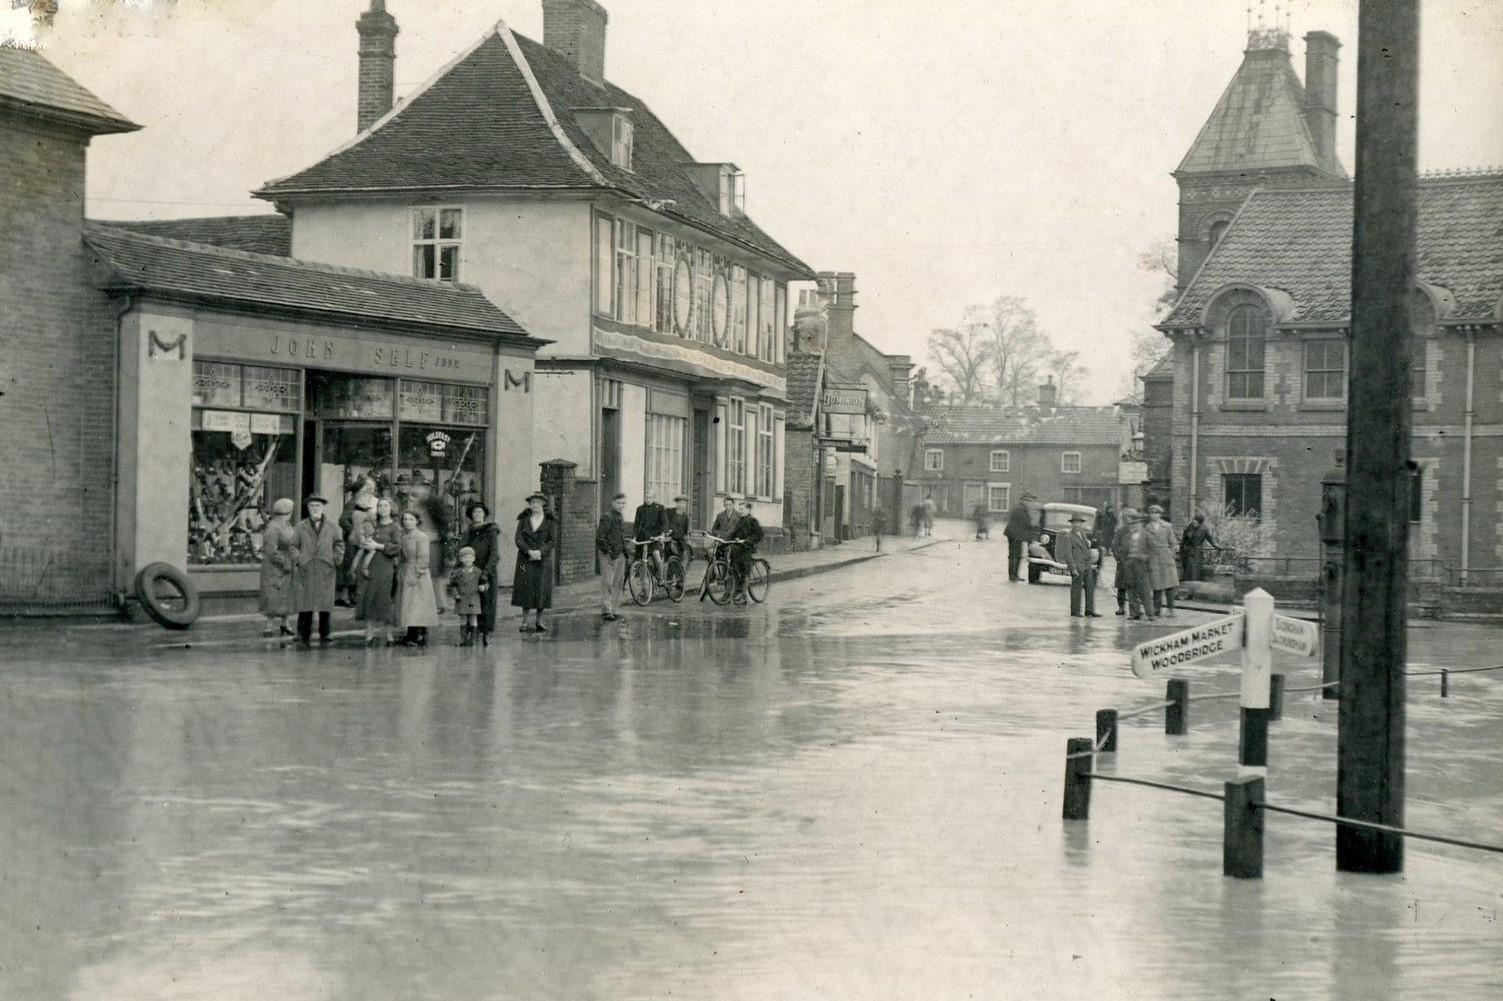 Albert Place flood